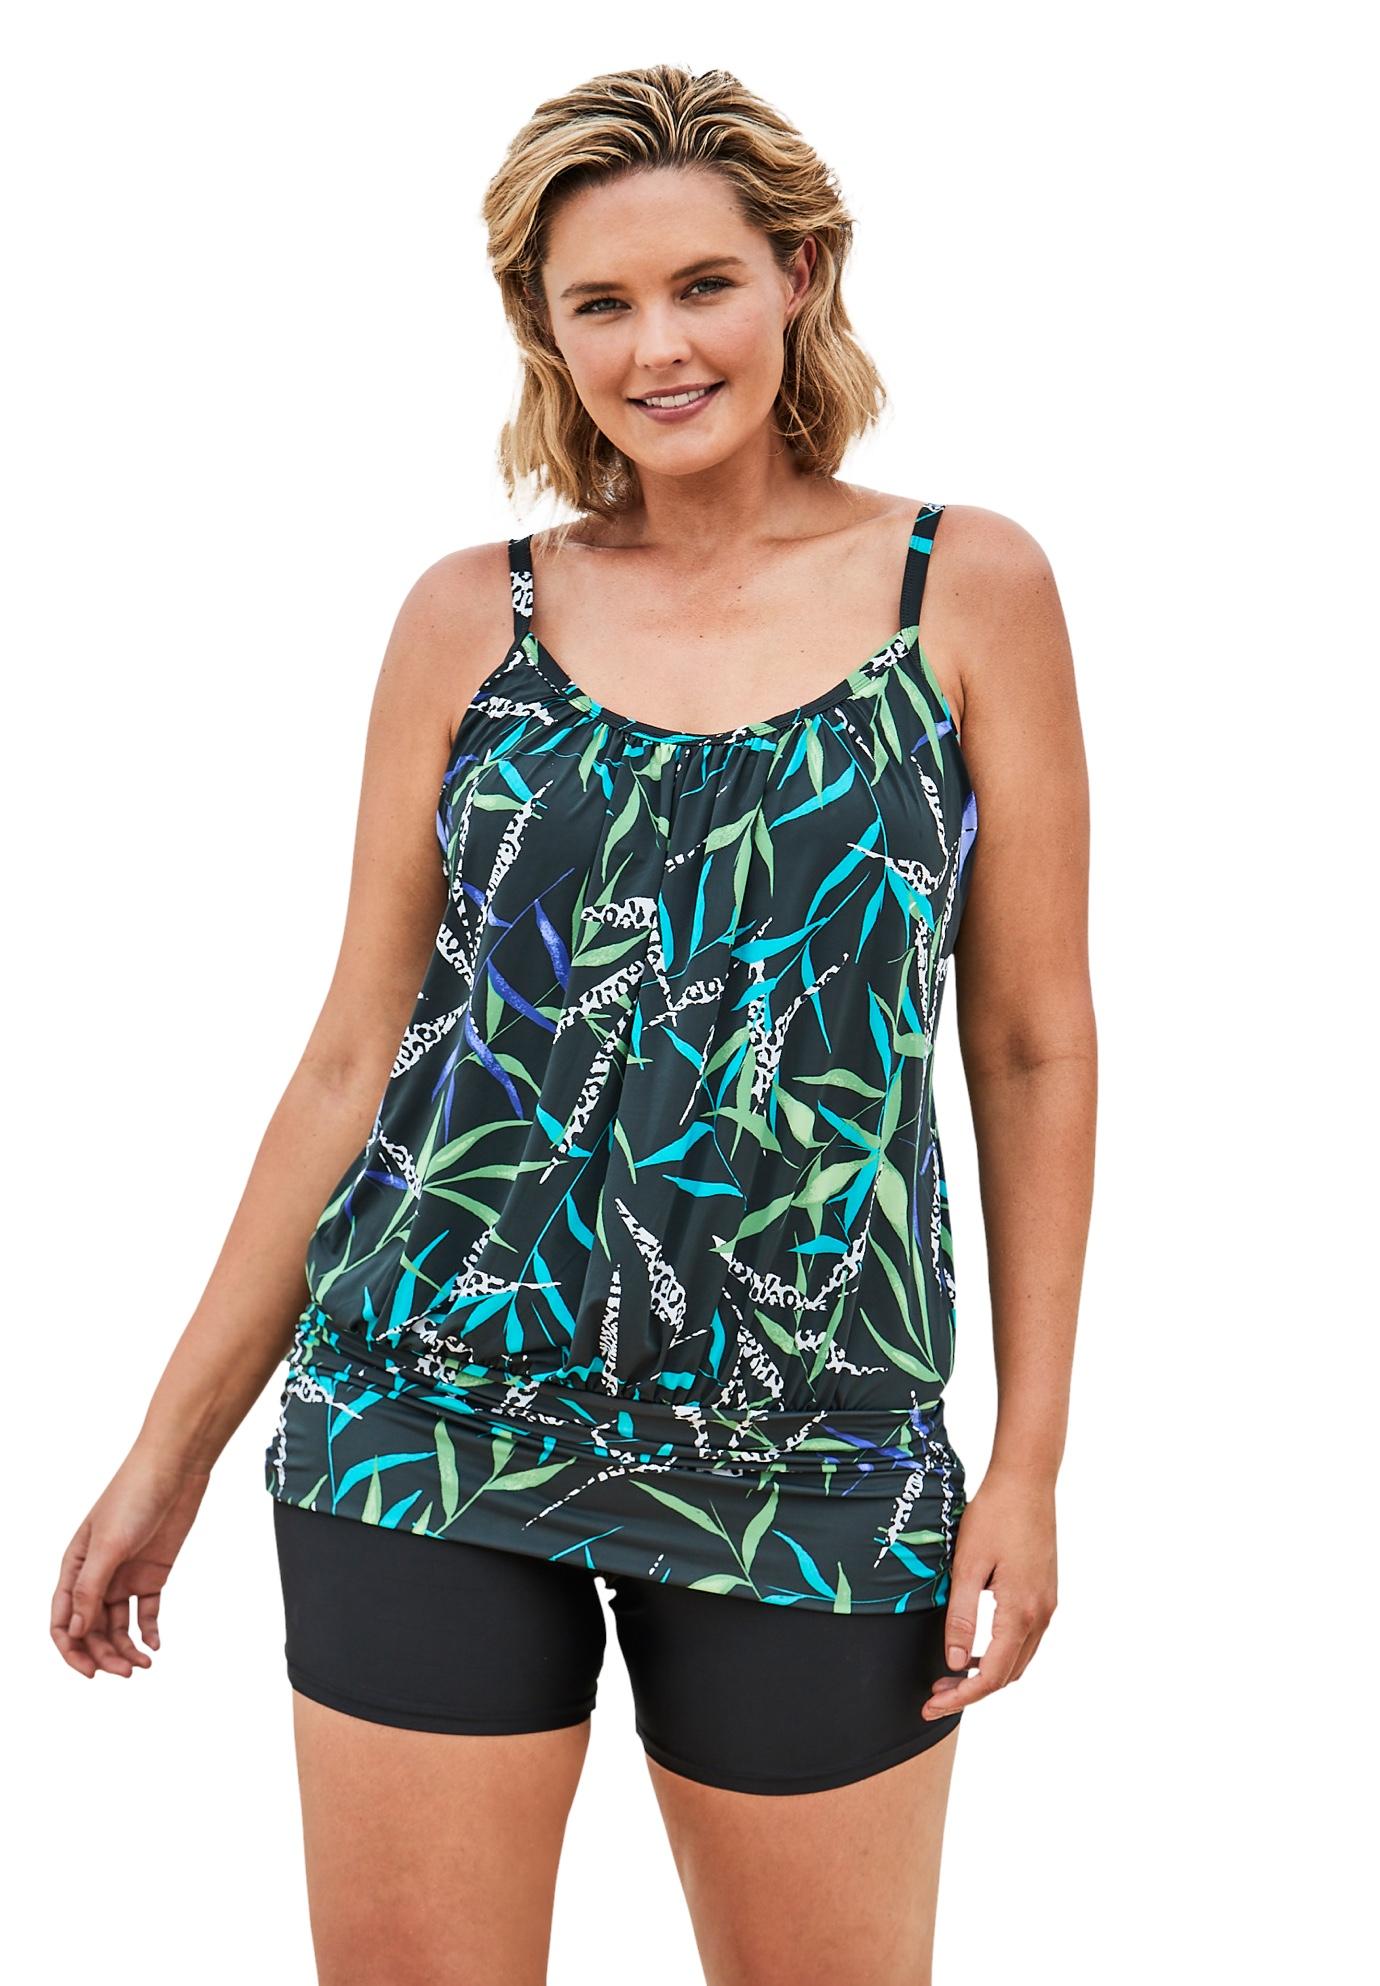 Plus Size Women's Lightweight Blouson Tankini Top by Swim 365 in Turq Multi Leaf Print